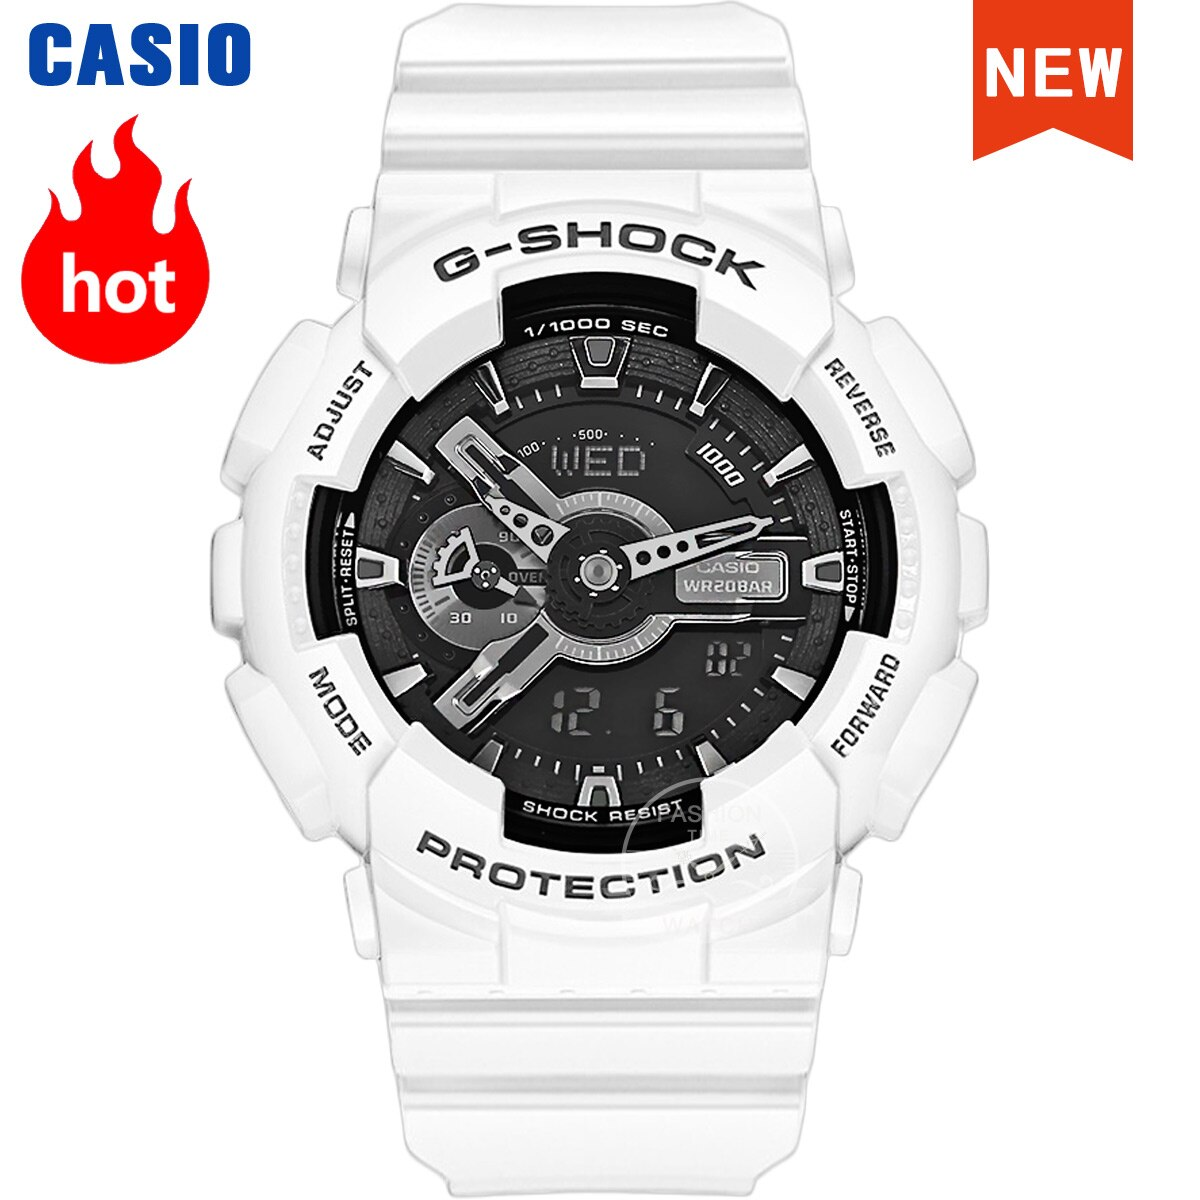 Reloj Casio para hombre g shock top de lujo resistente al agua, reloj deportivo de cuarzo LED digital militar, reloj masculino